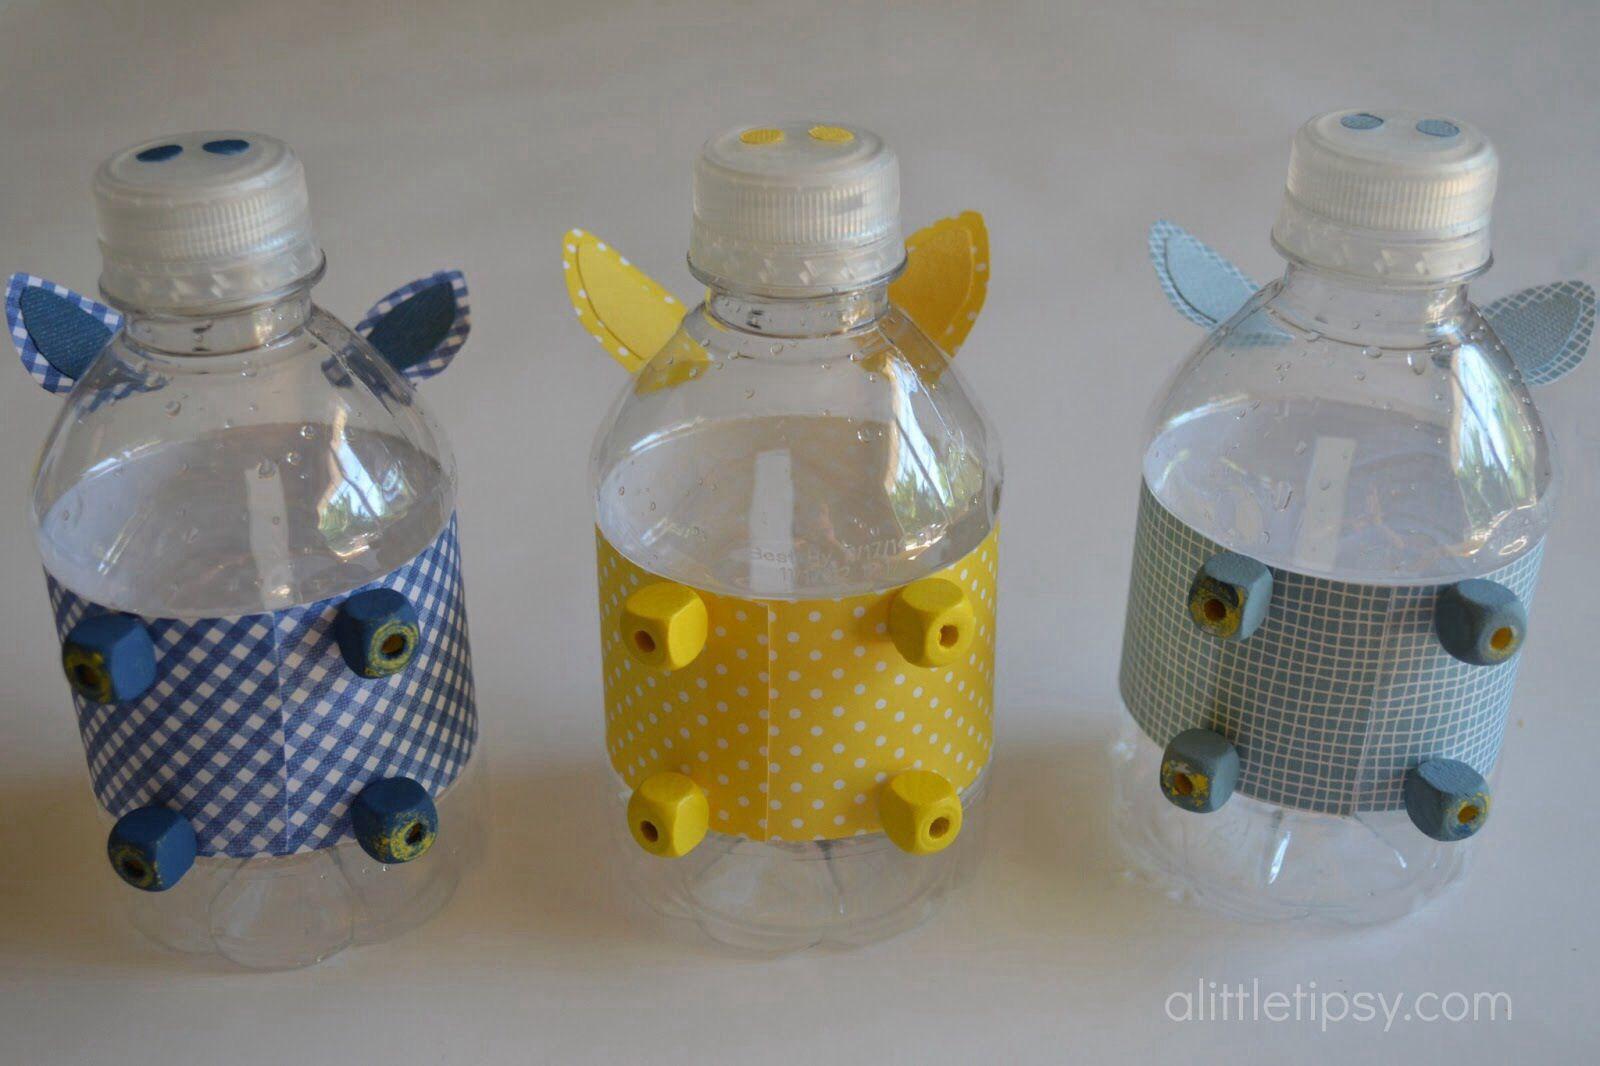 Bottle piggy banks 12monthsofmartha giveaway homemade for Plastic bottle coin bank